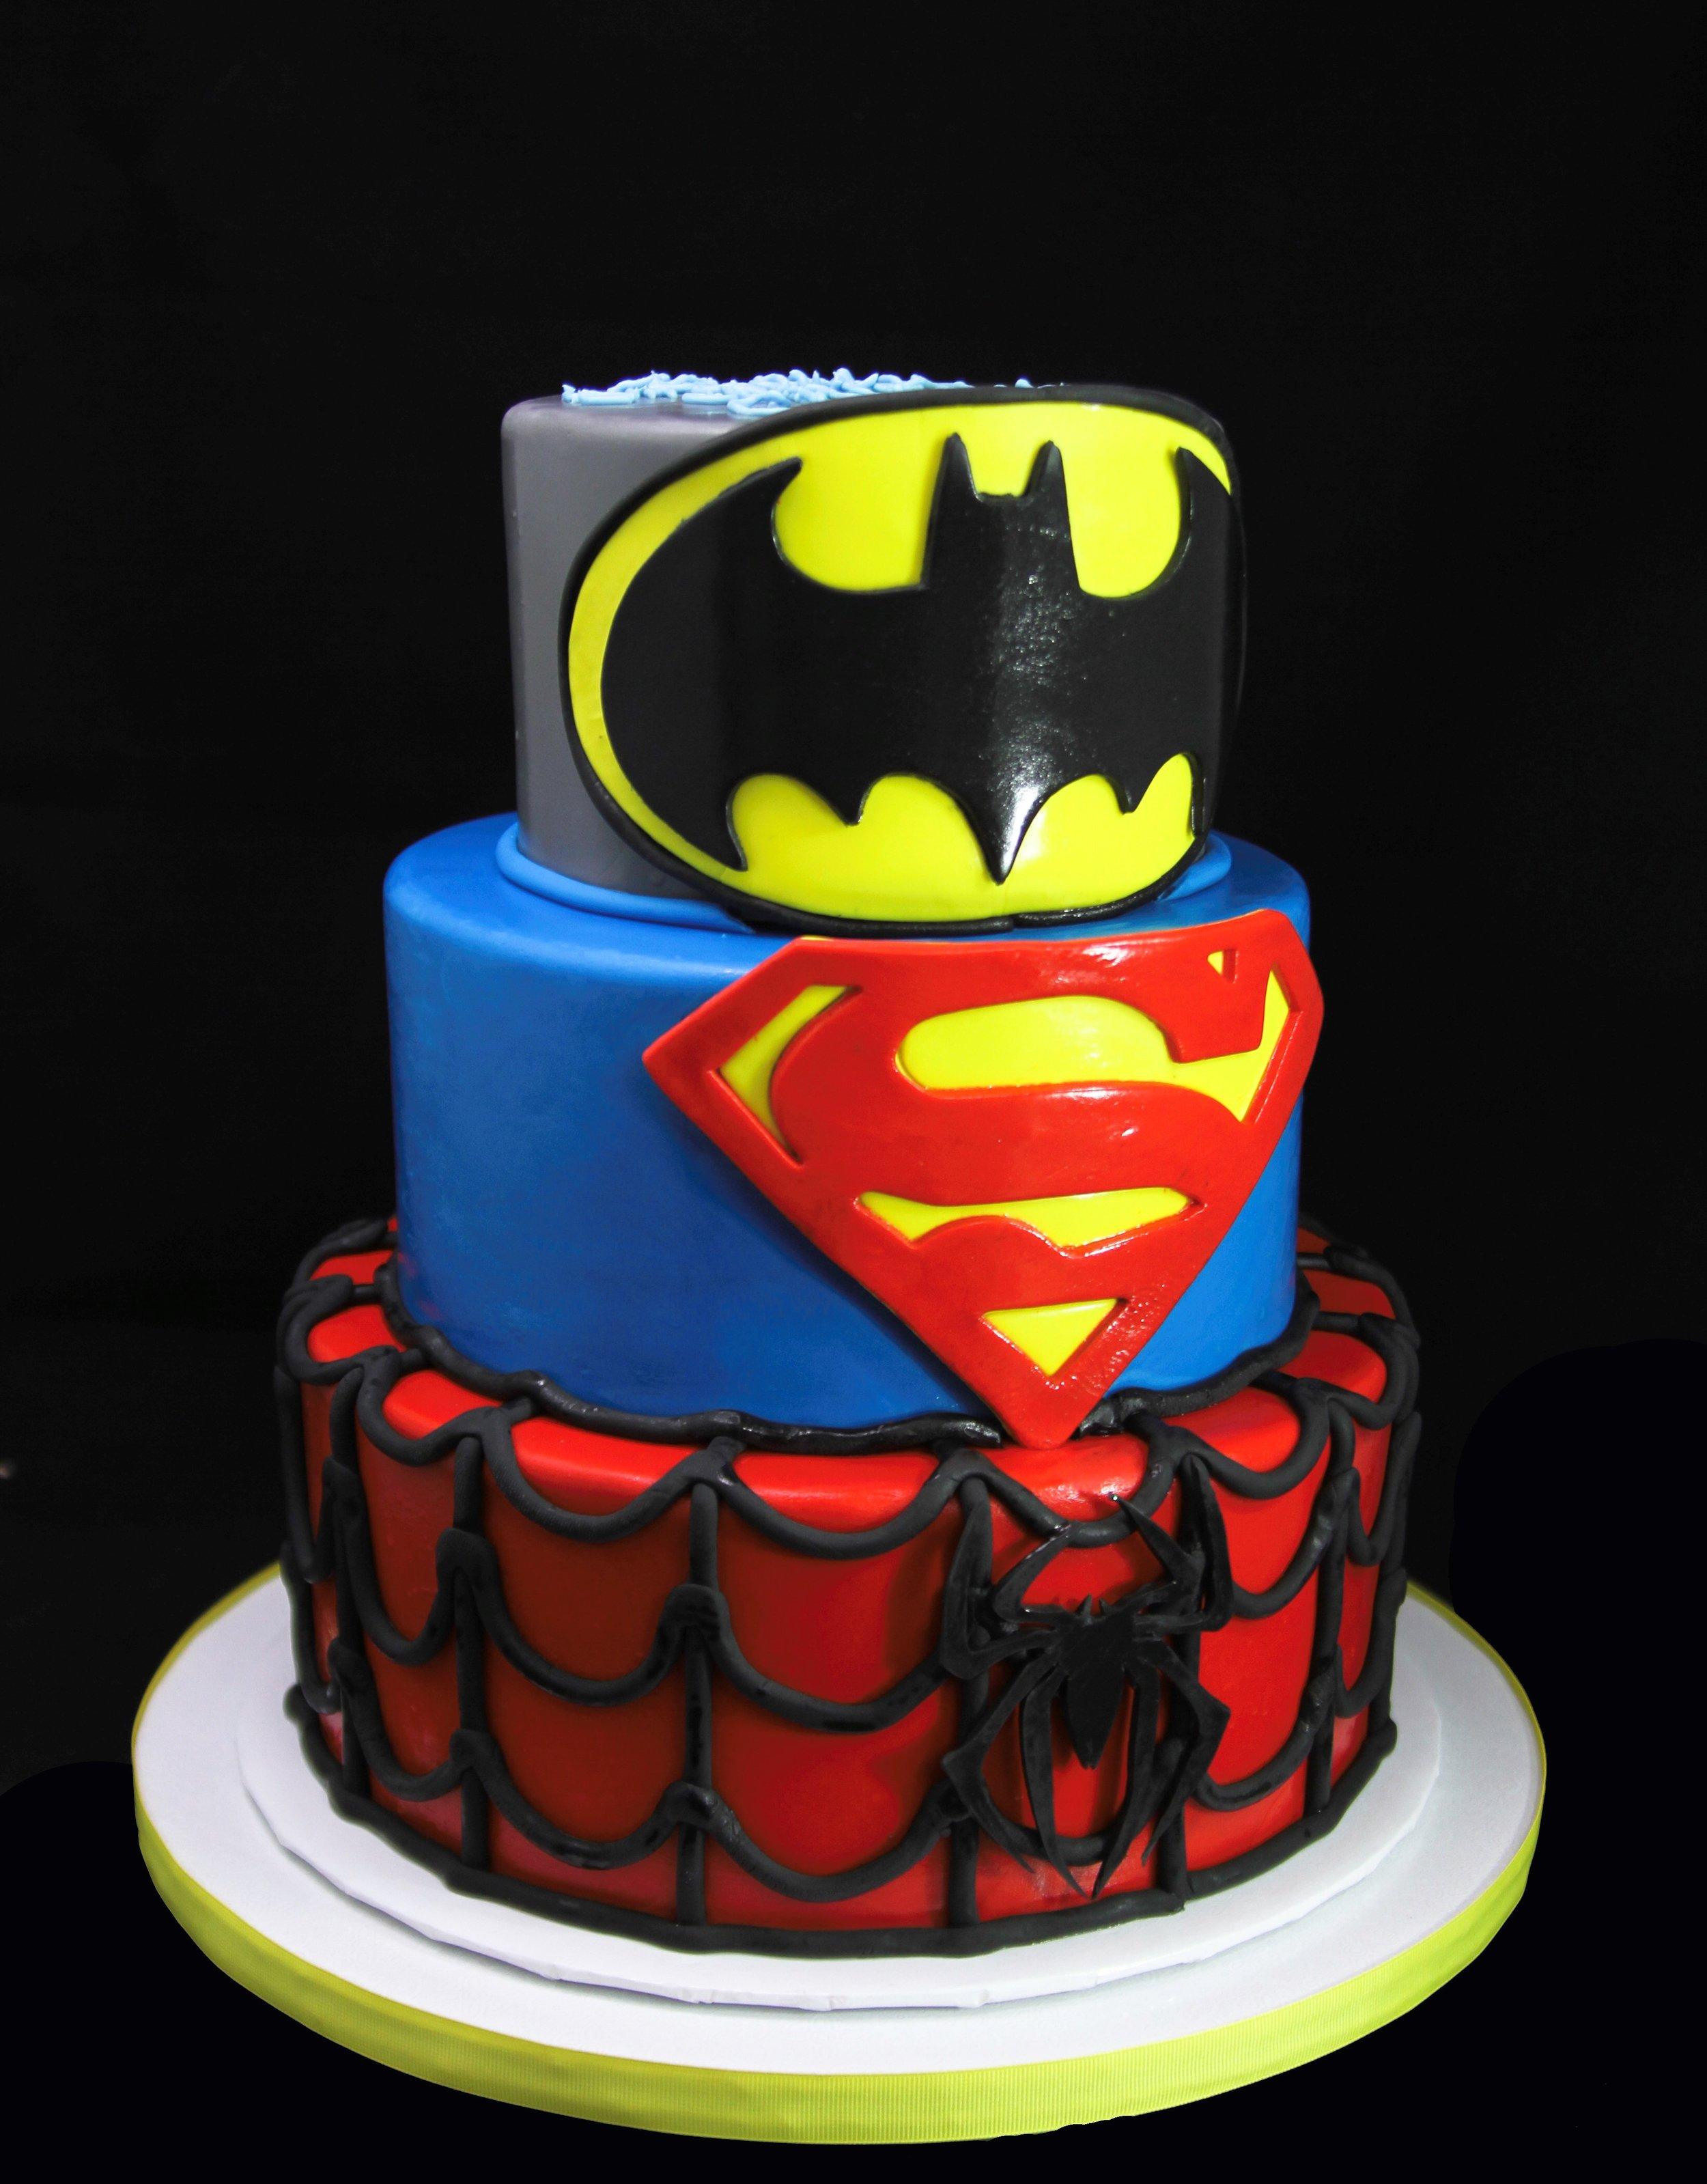 Superhero Cake fixed.jpg